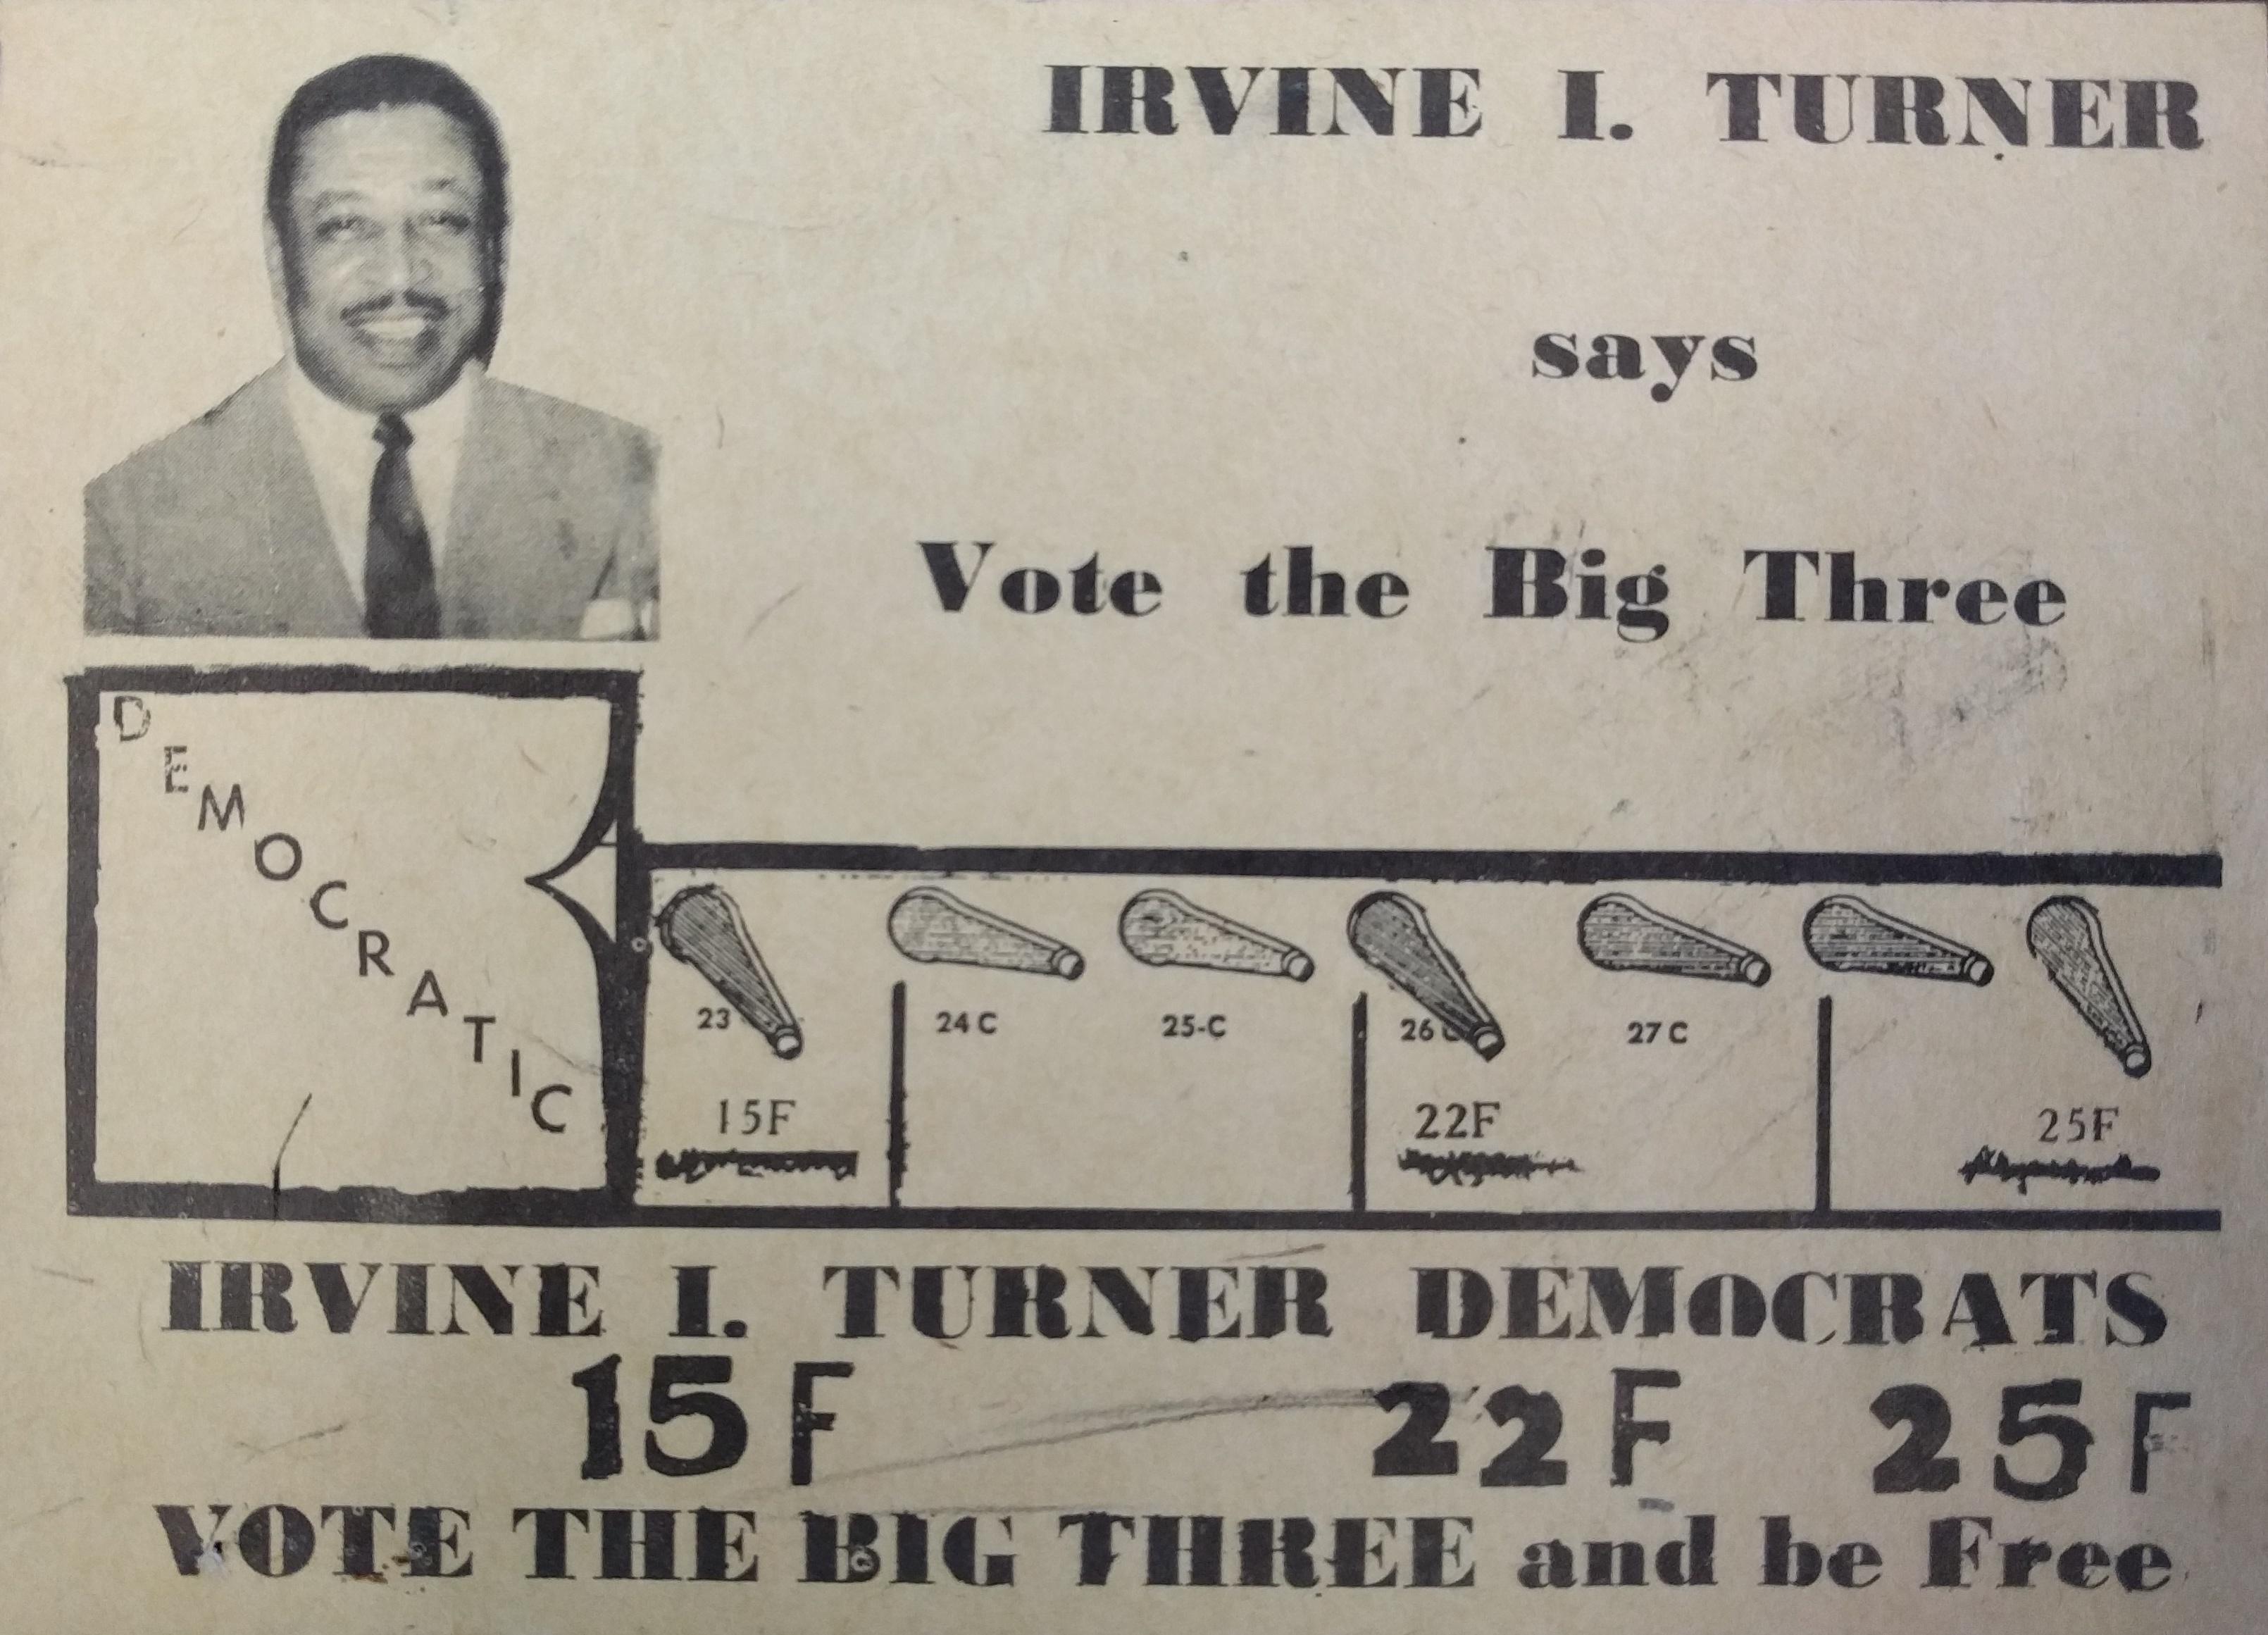 Irvine Turner Campaign Card